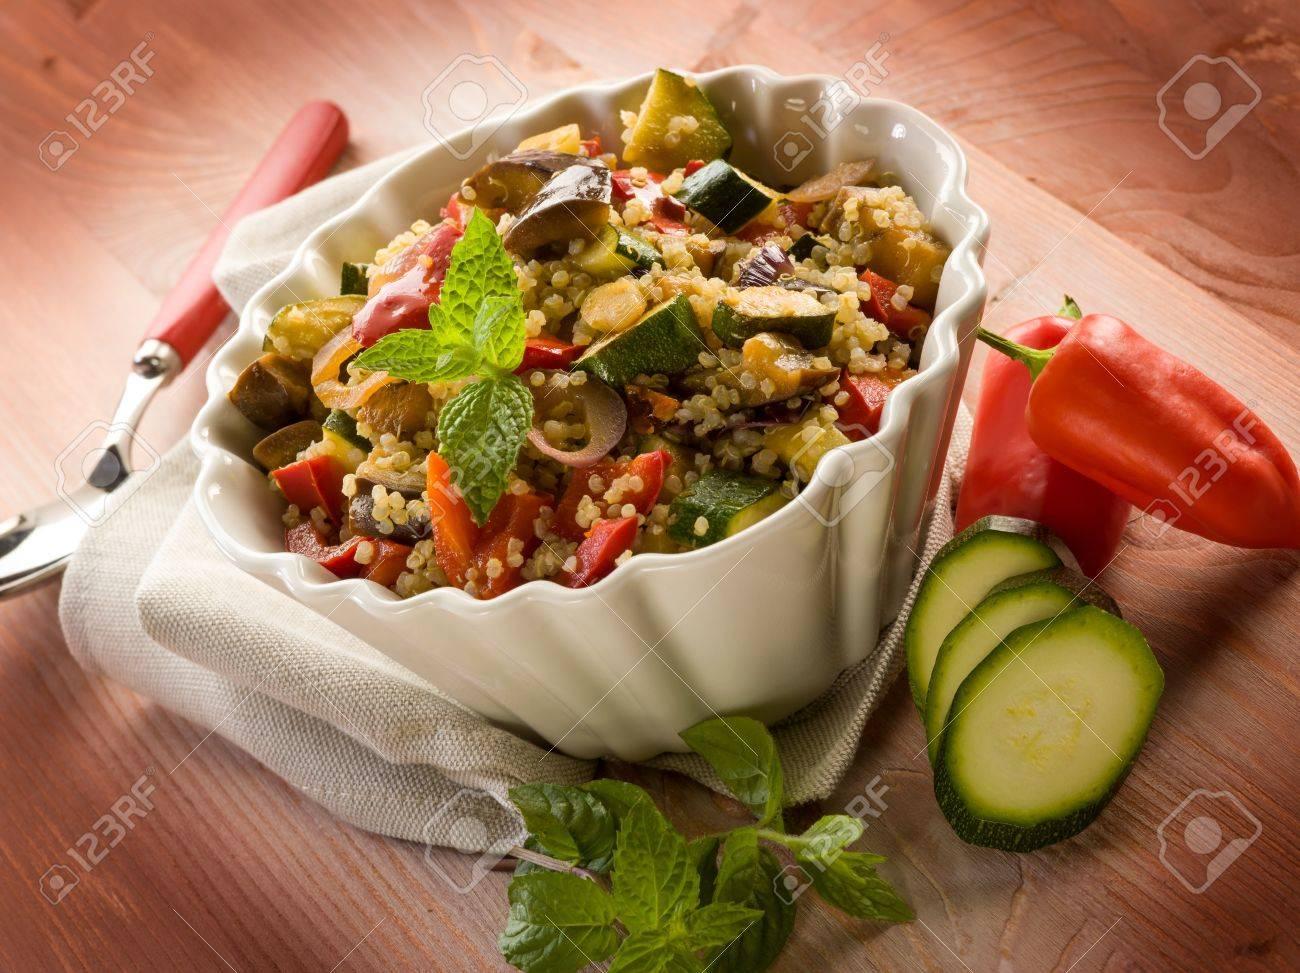 quinoa sald with vegetables, vegetarian food Stock Photo - 14451619